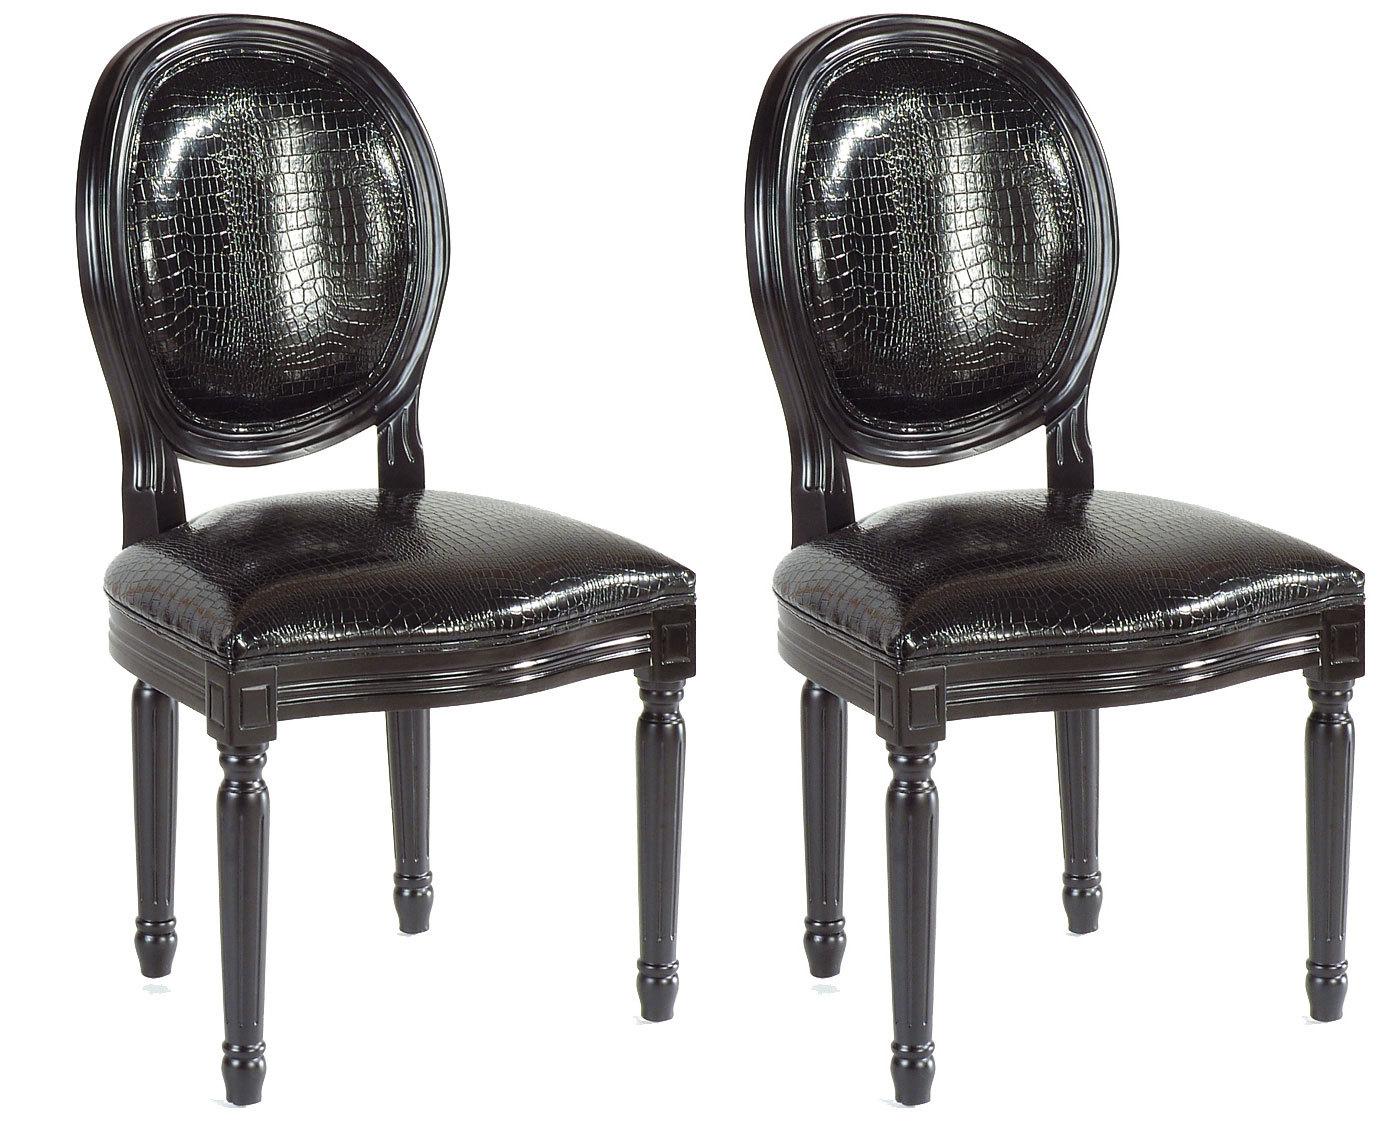 Chaise baroque salle manger noir medaillon lot de 2 for Chaise noir salle a manger